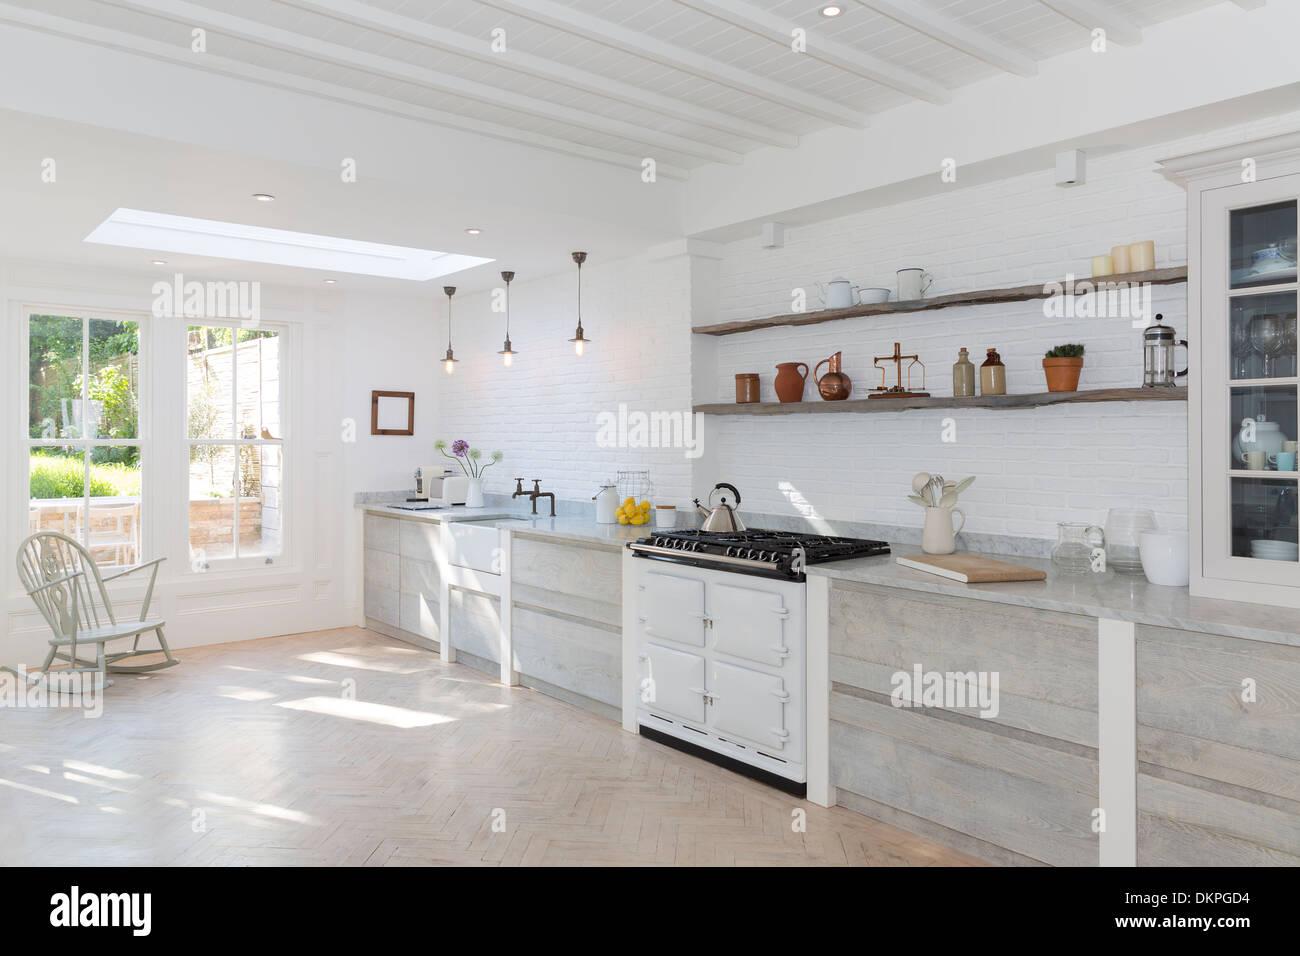 Luxury rustic kitchen - Stock Image